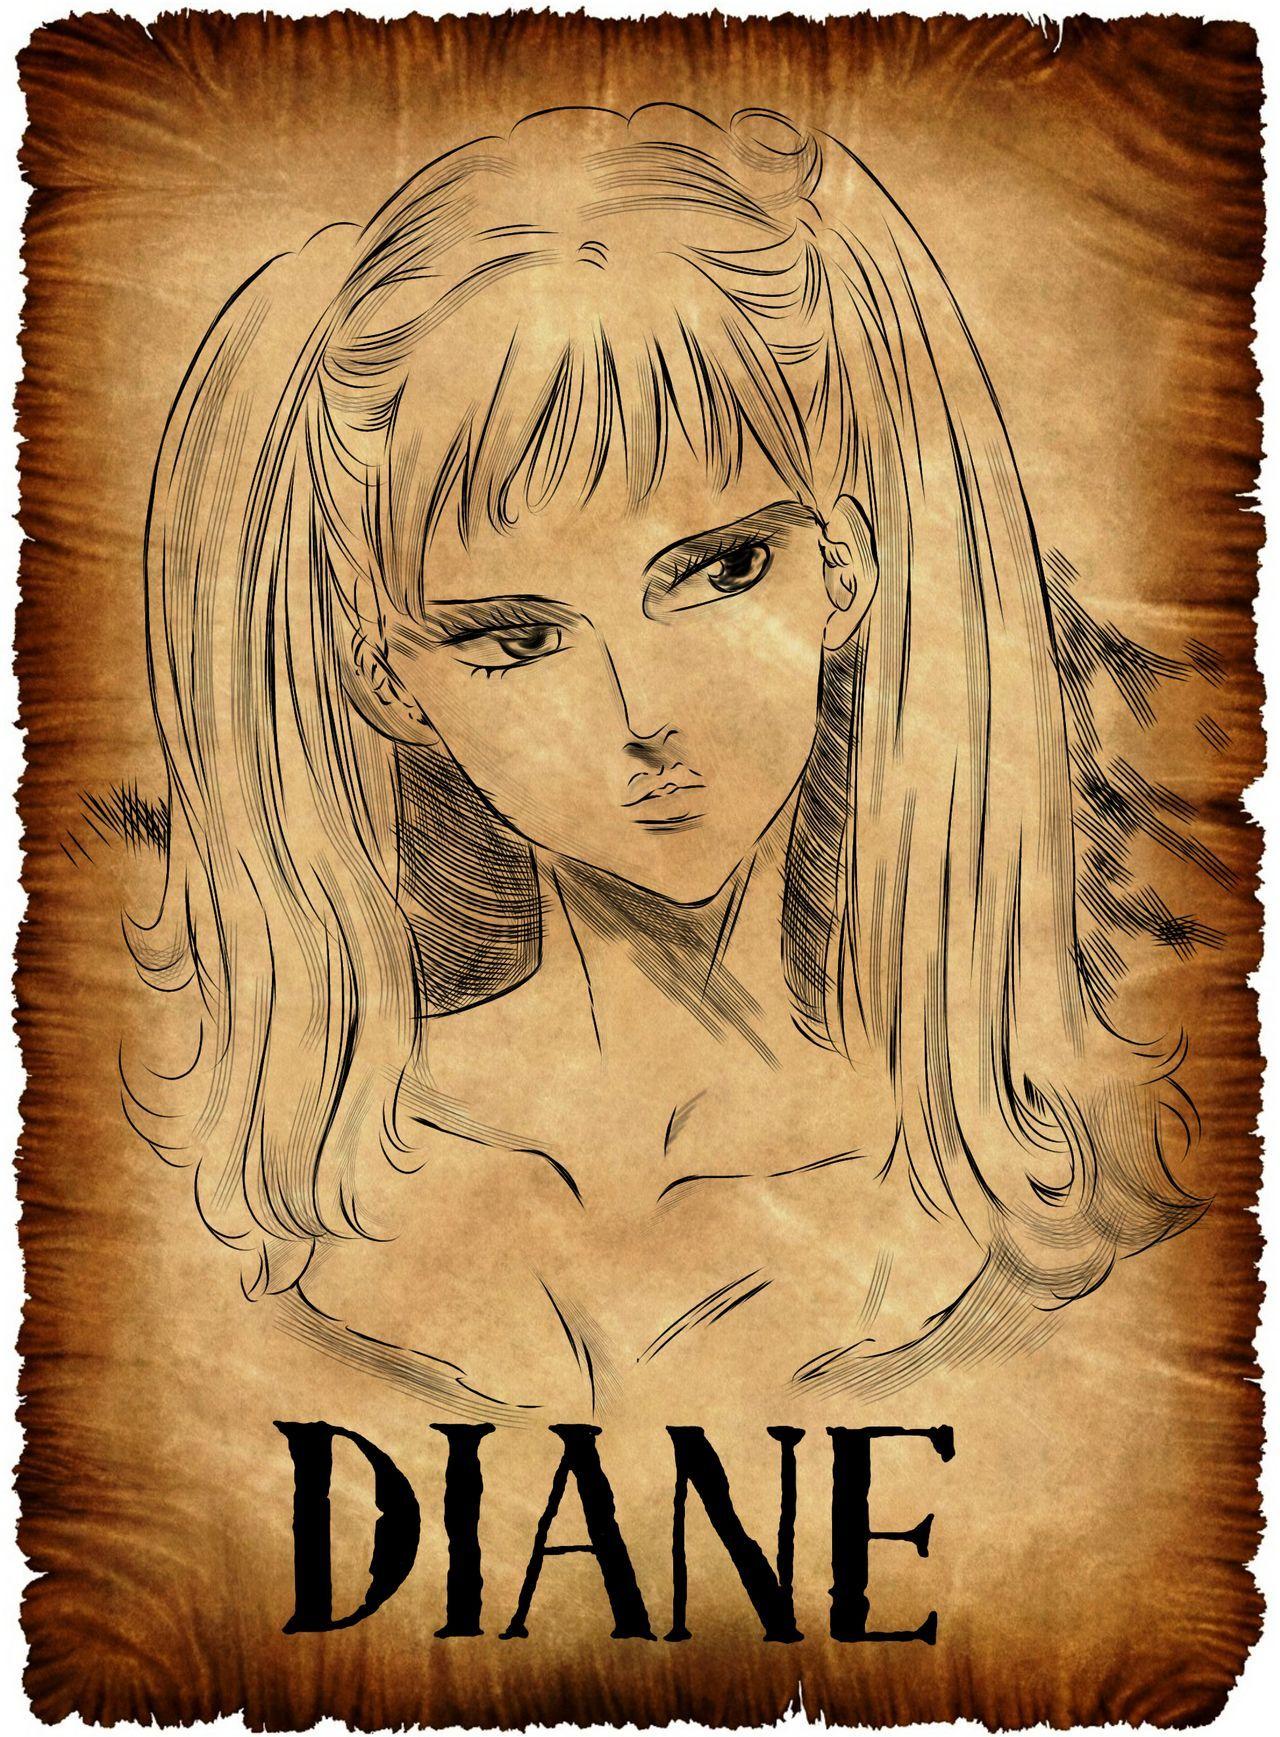 Photo of Diane nanatsu no taizai by d4nartss on DeviantArt